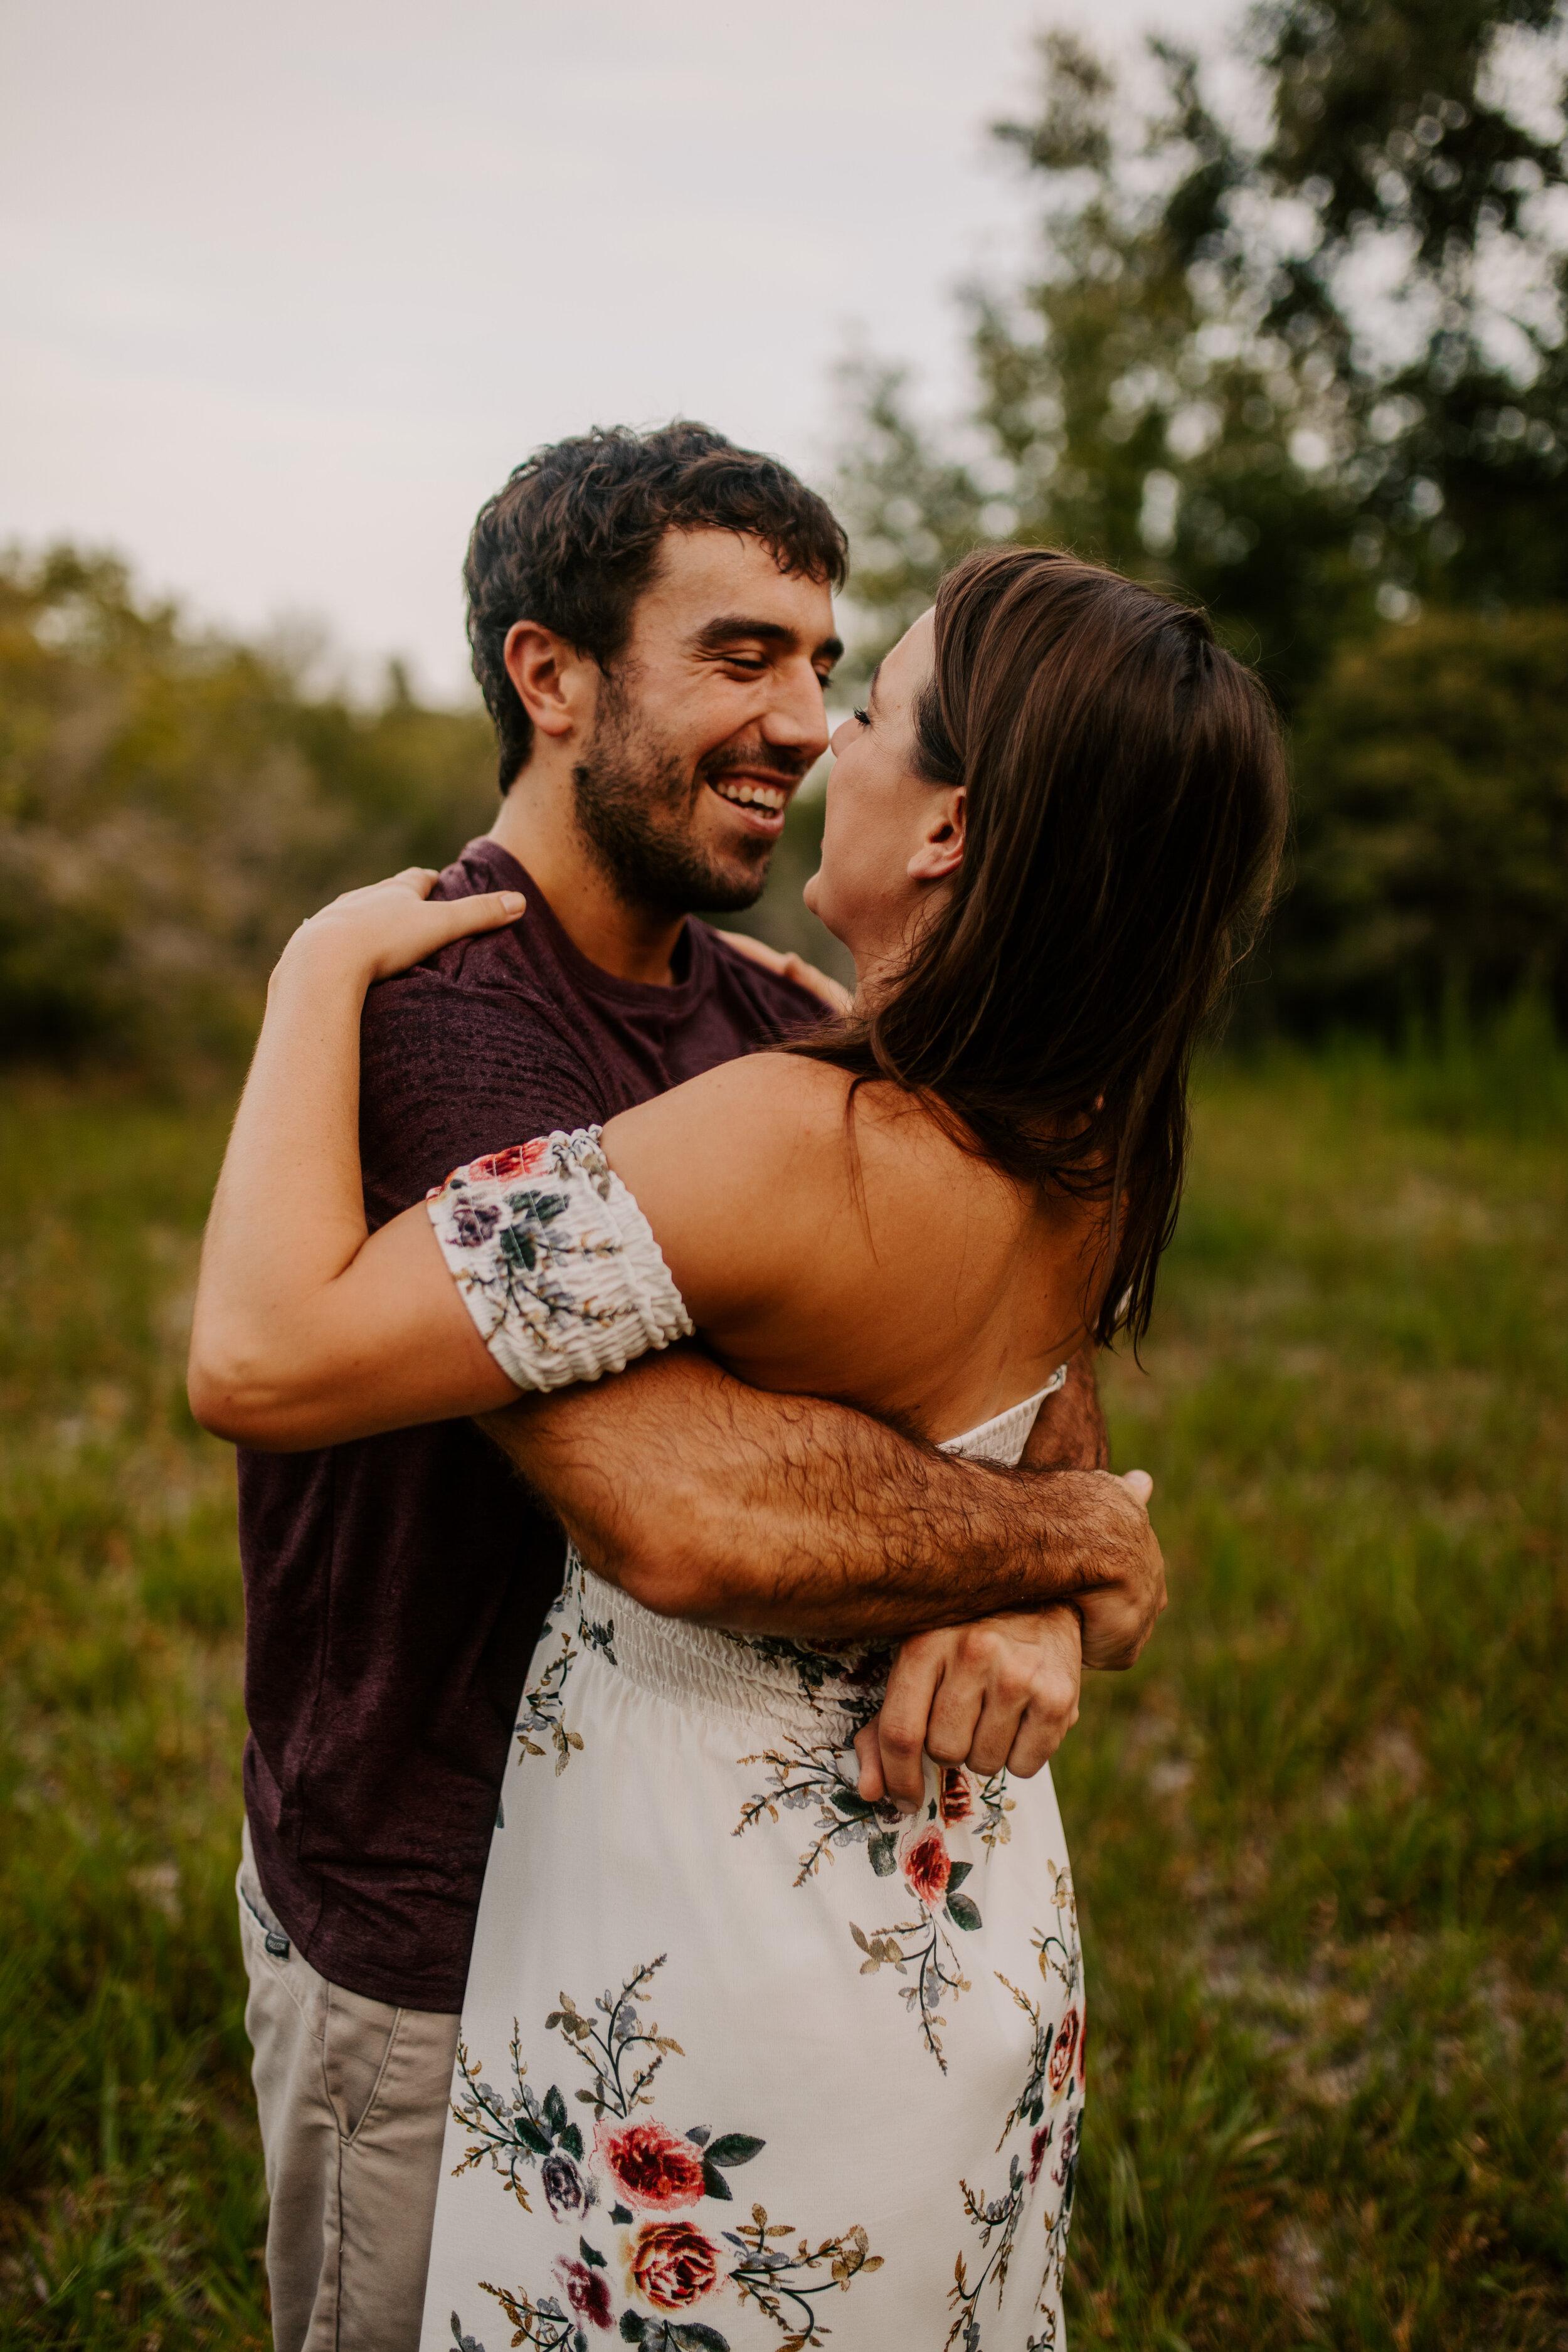 Jenna_+_Ryan_-_Native_Expressions_-_Florida_Engagement-180.jpg